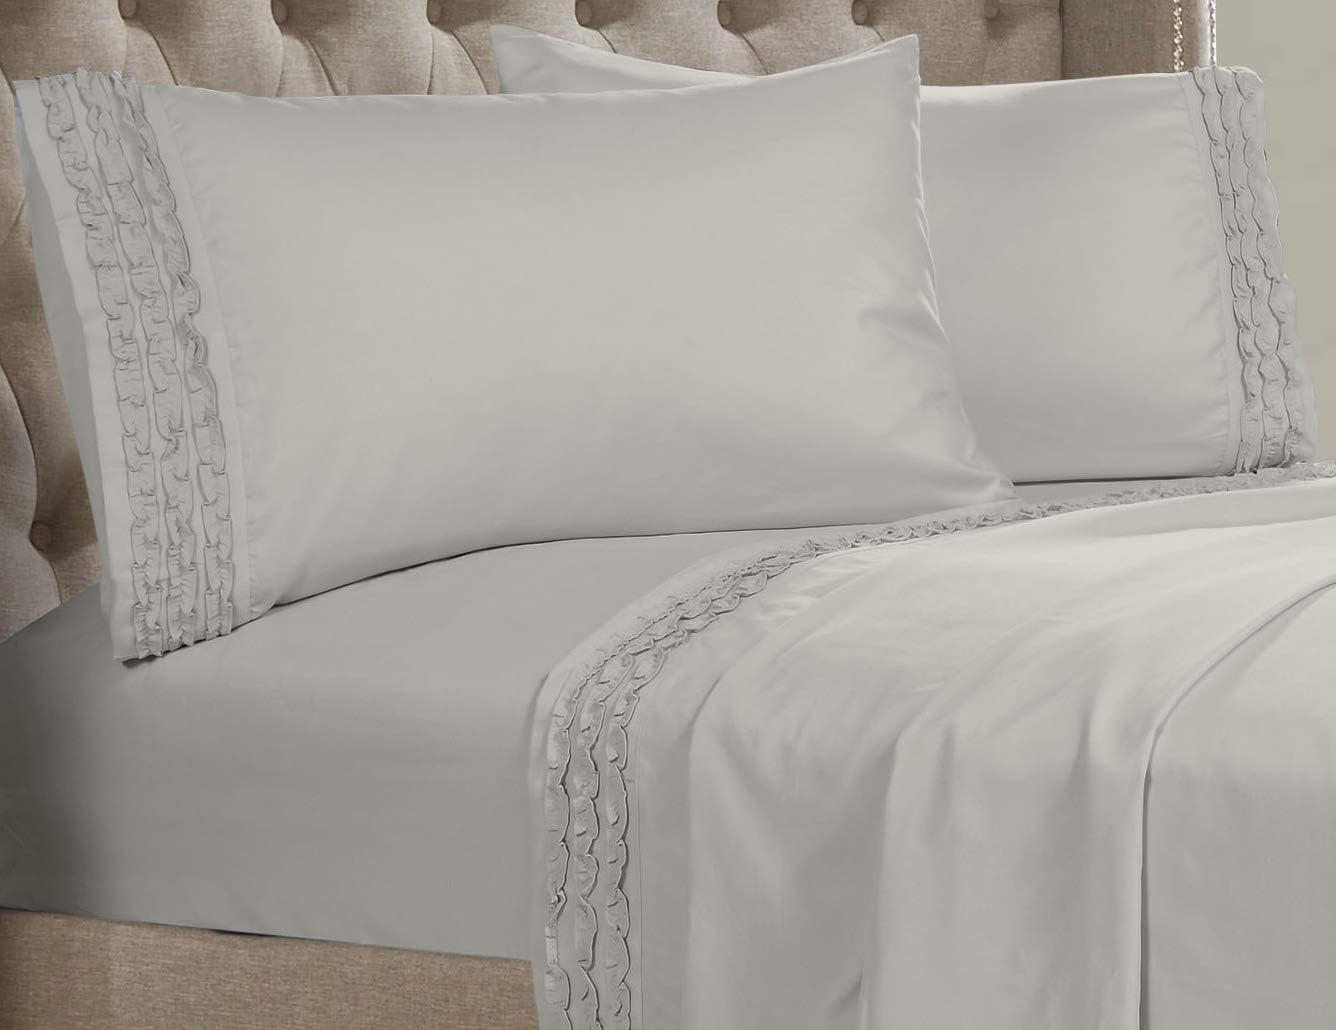 Posh Home Ruffle Sheet Set - Double Brushed 4 Piece Ultra Soft Wrinkle & Fade Resistant (Twin, Feather Grey - Triple Ruffle)